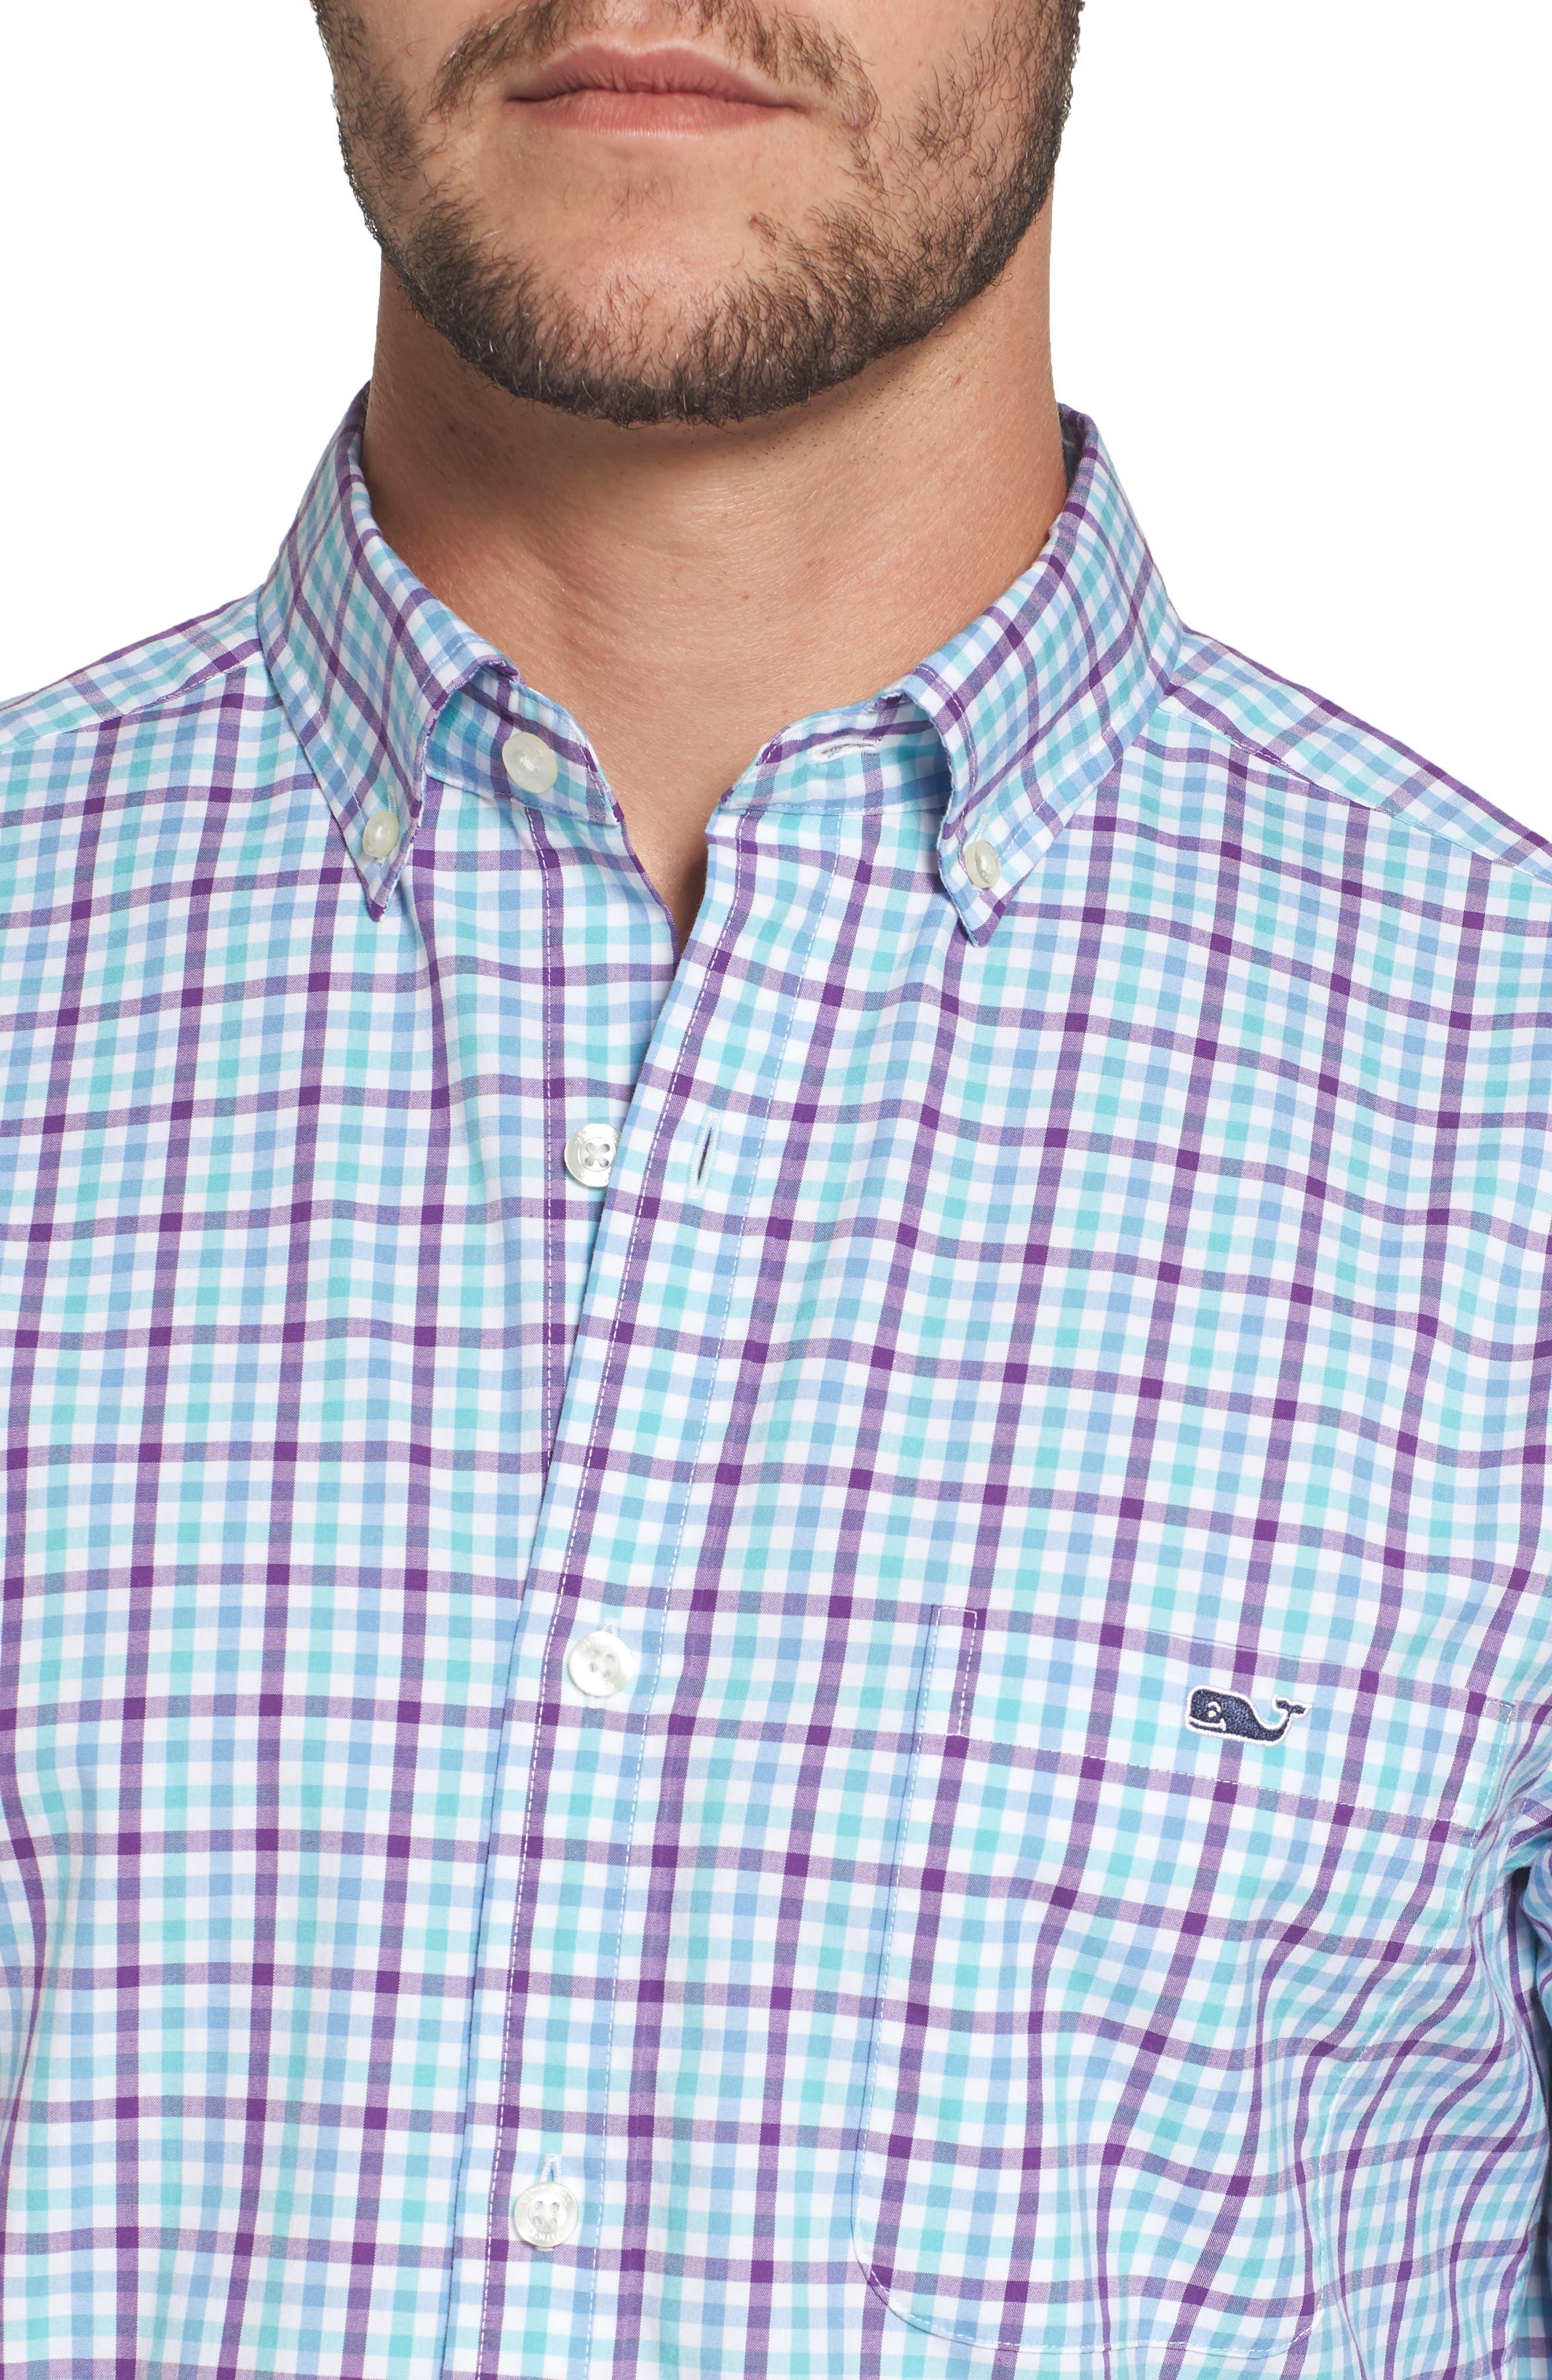 Tucker Classic Fit Gingham Sport Shirt,                             Alternate thumbnail 4, color,                             517